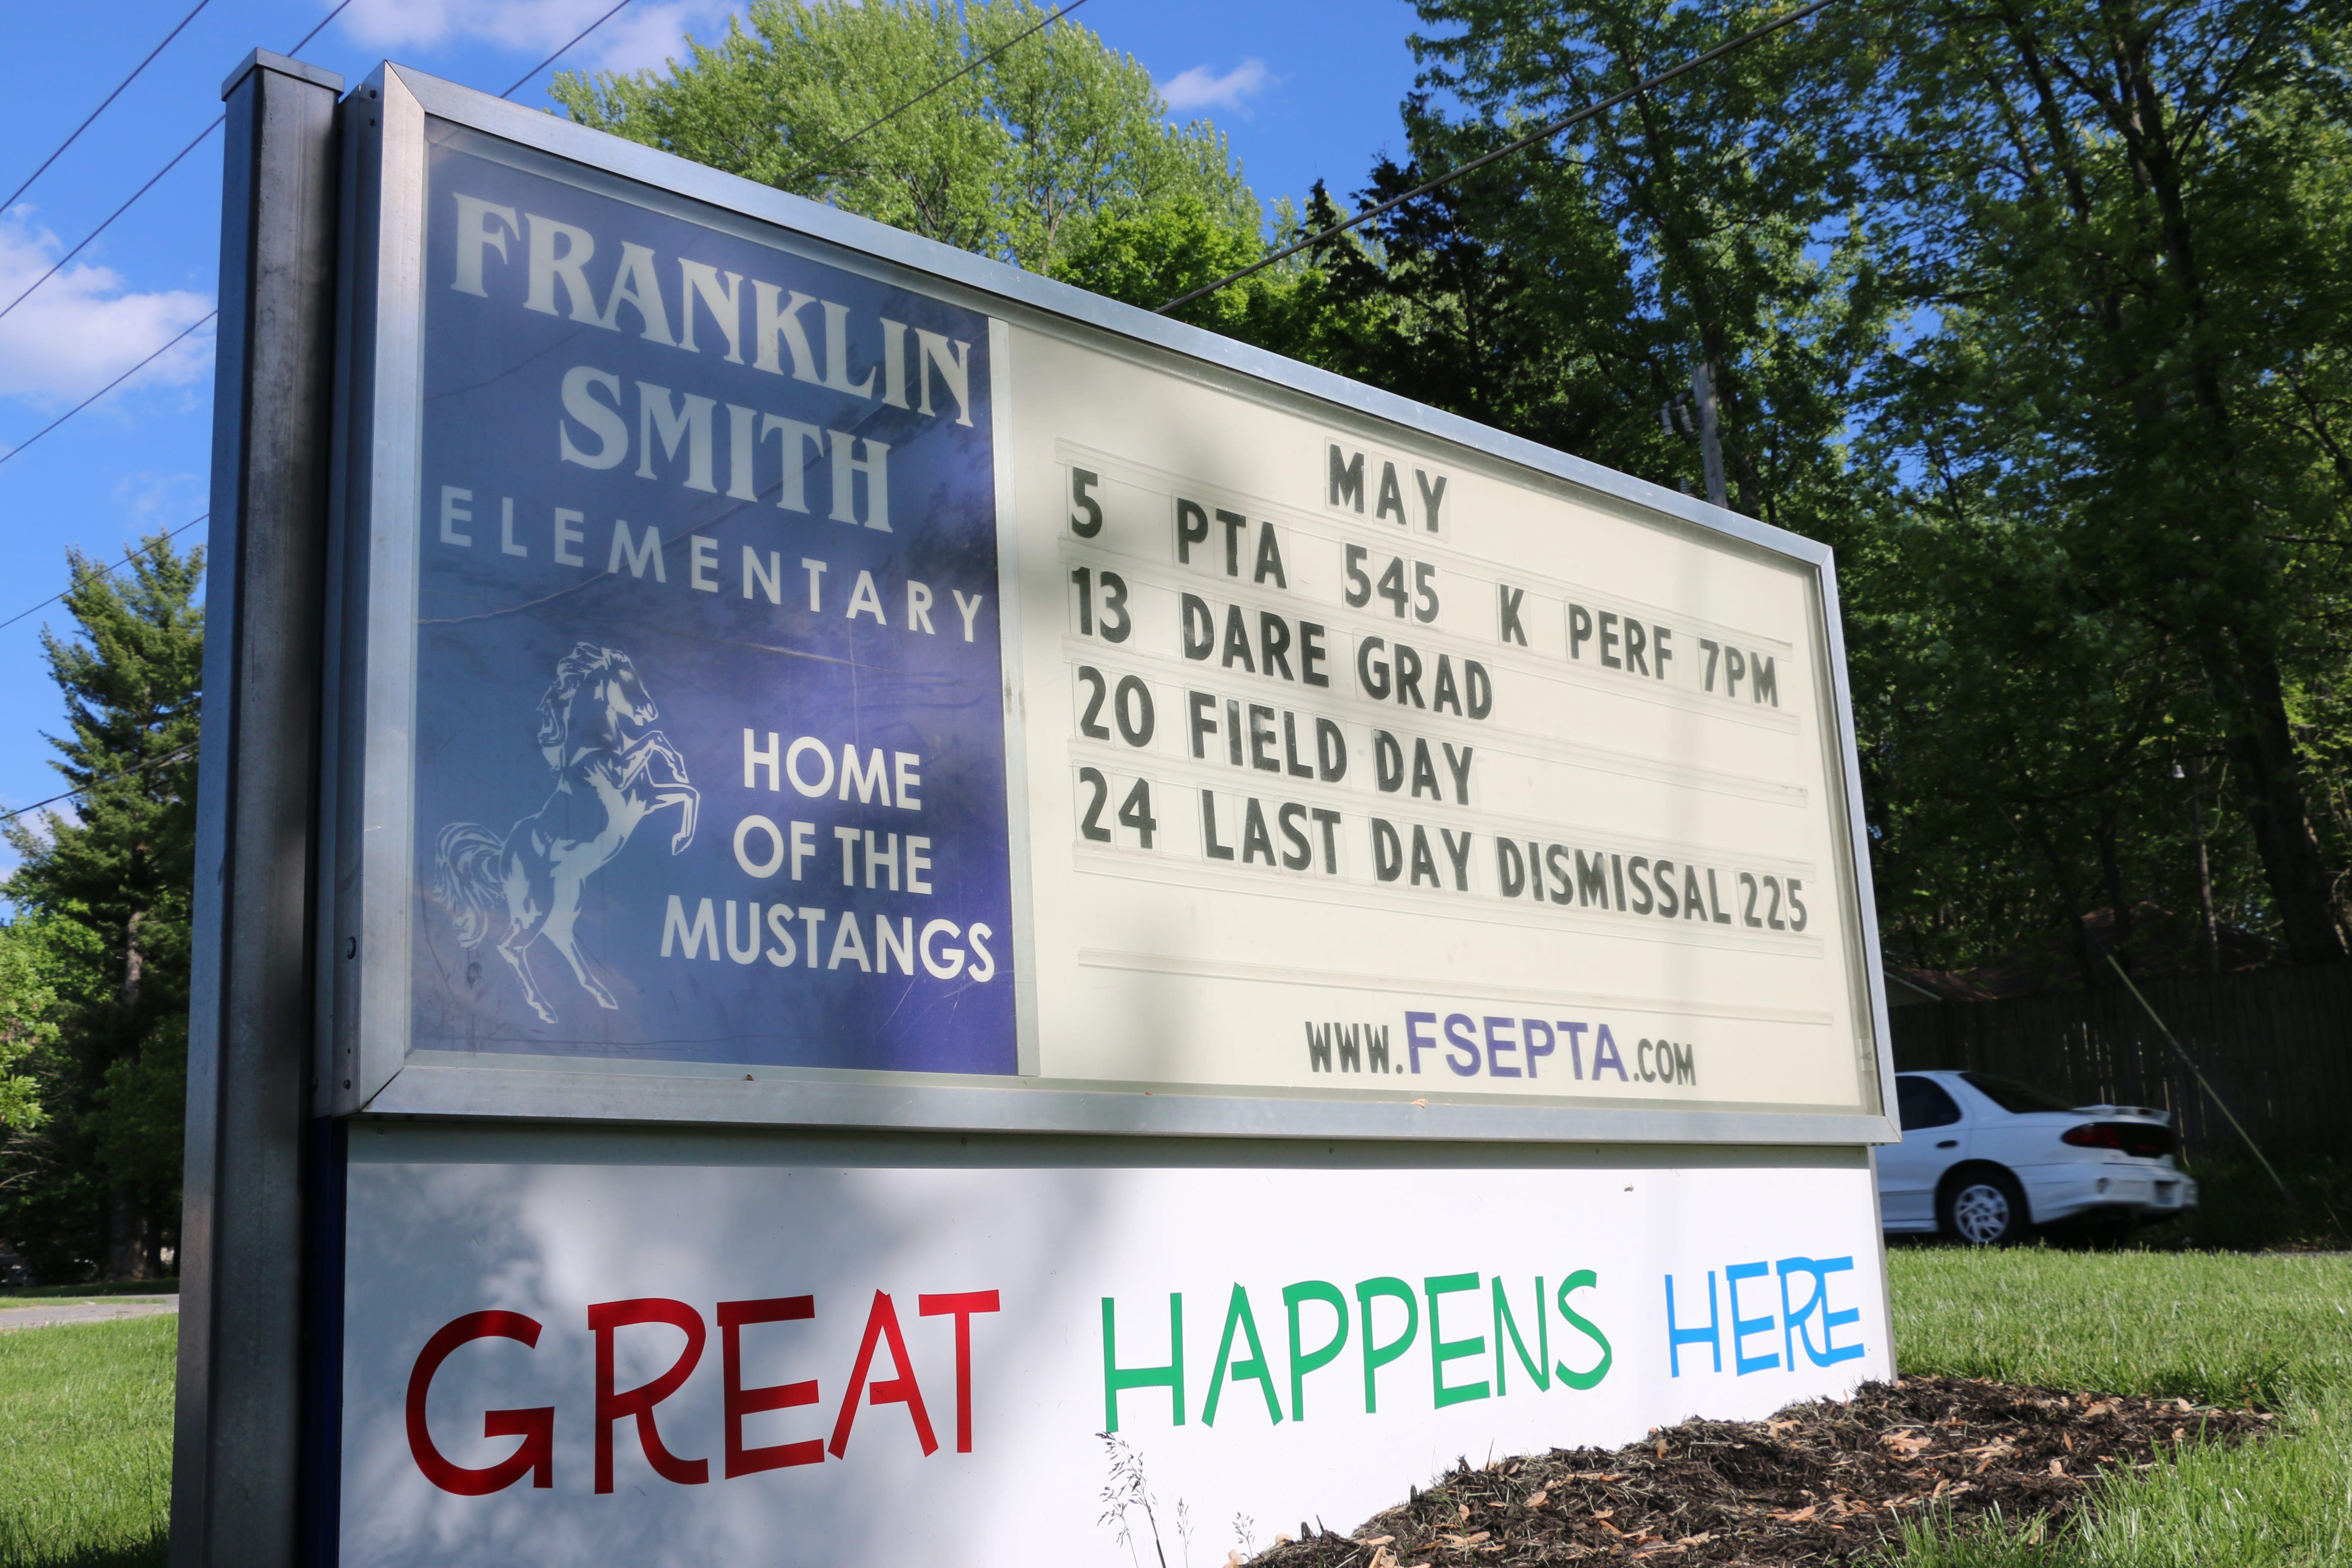 Franklin Smith school sign